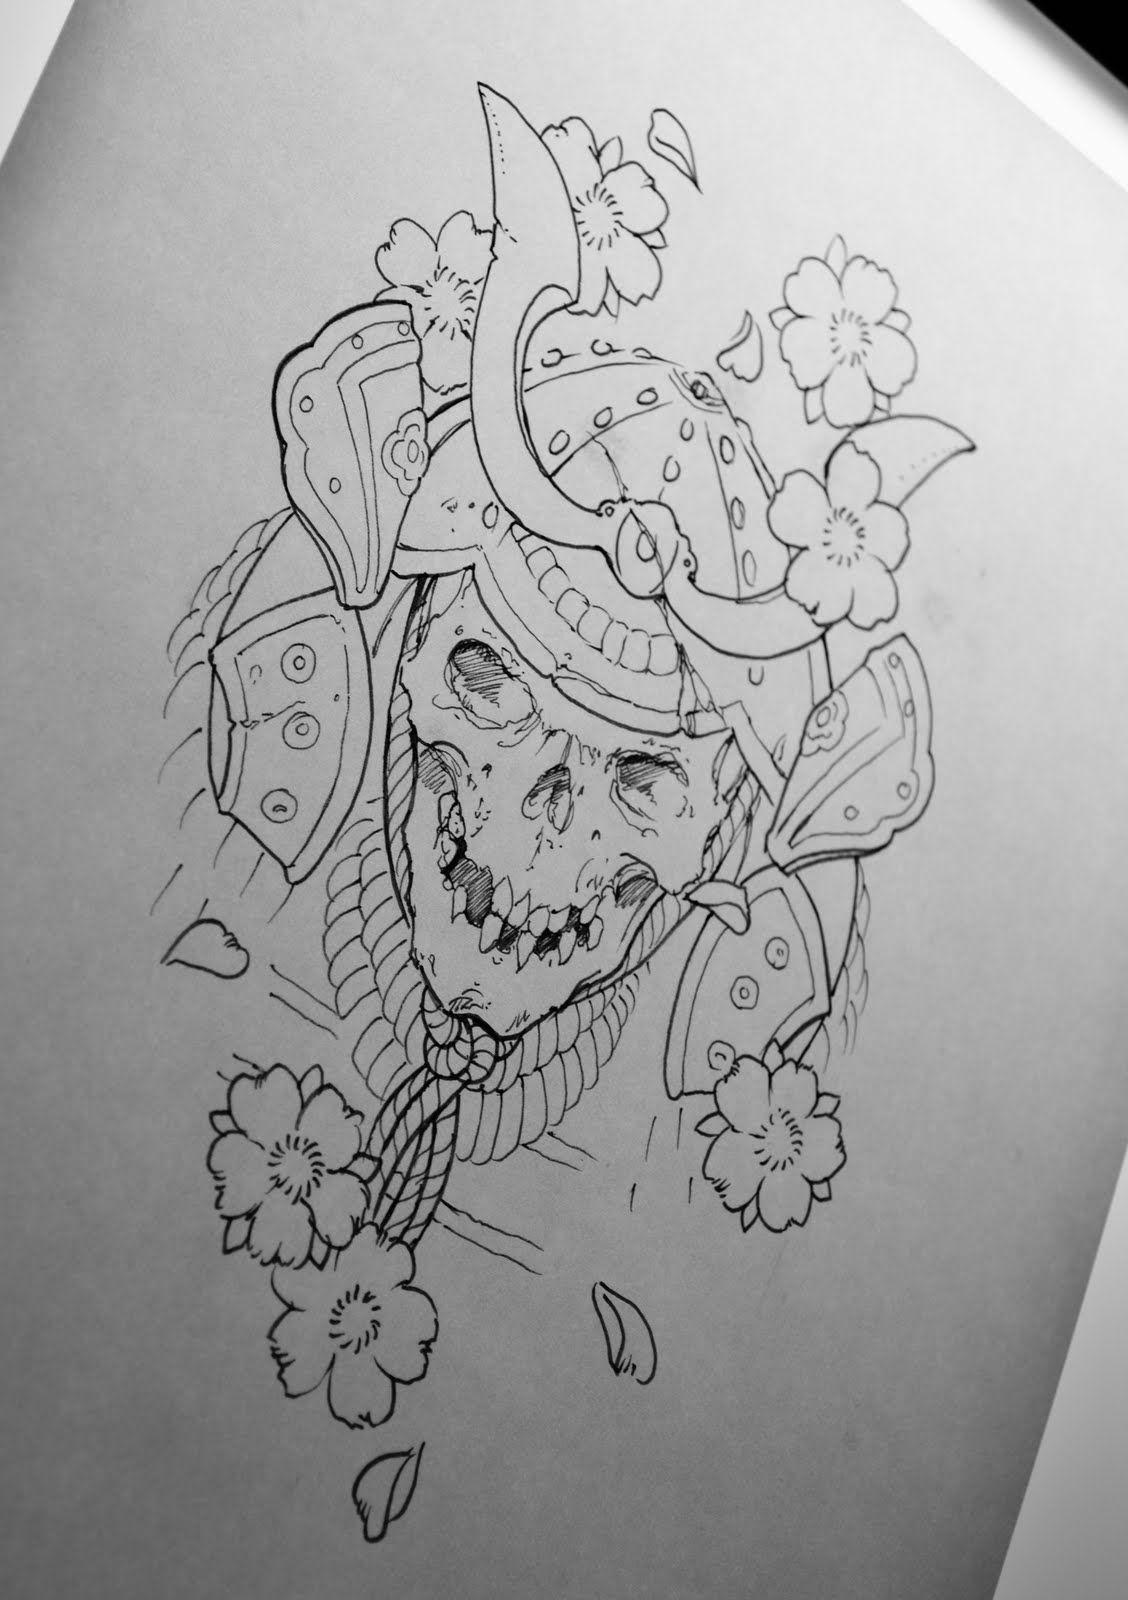 Japanese Skull Drawing Outline Wiring Diagrams 40w Electronic Ballast Circuit Diagram Image Galleries Imagekbcom Samurai Tattoo Leg Sleeve Pinterest Tattoos Rh Com Rose Simple